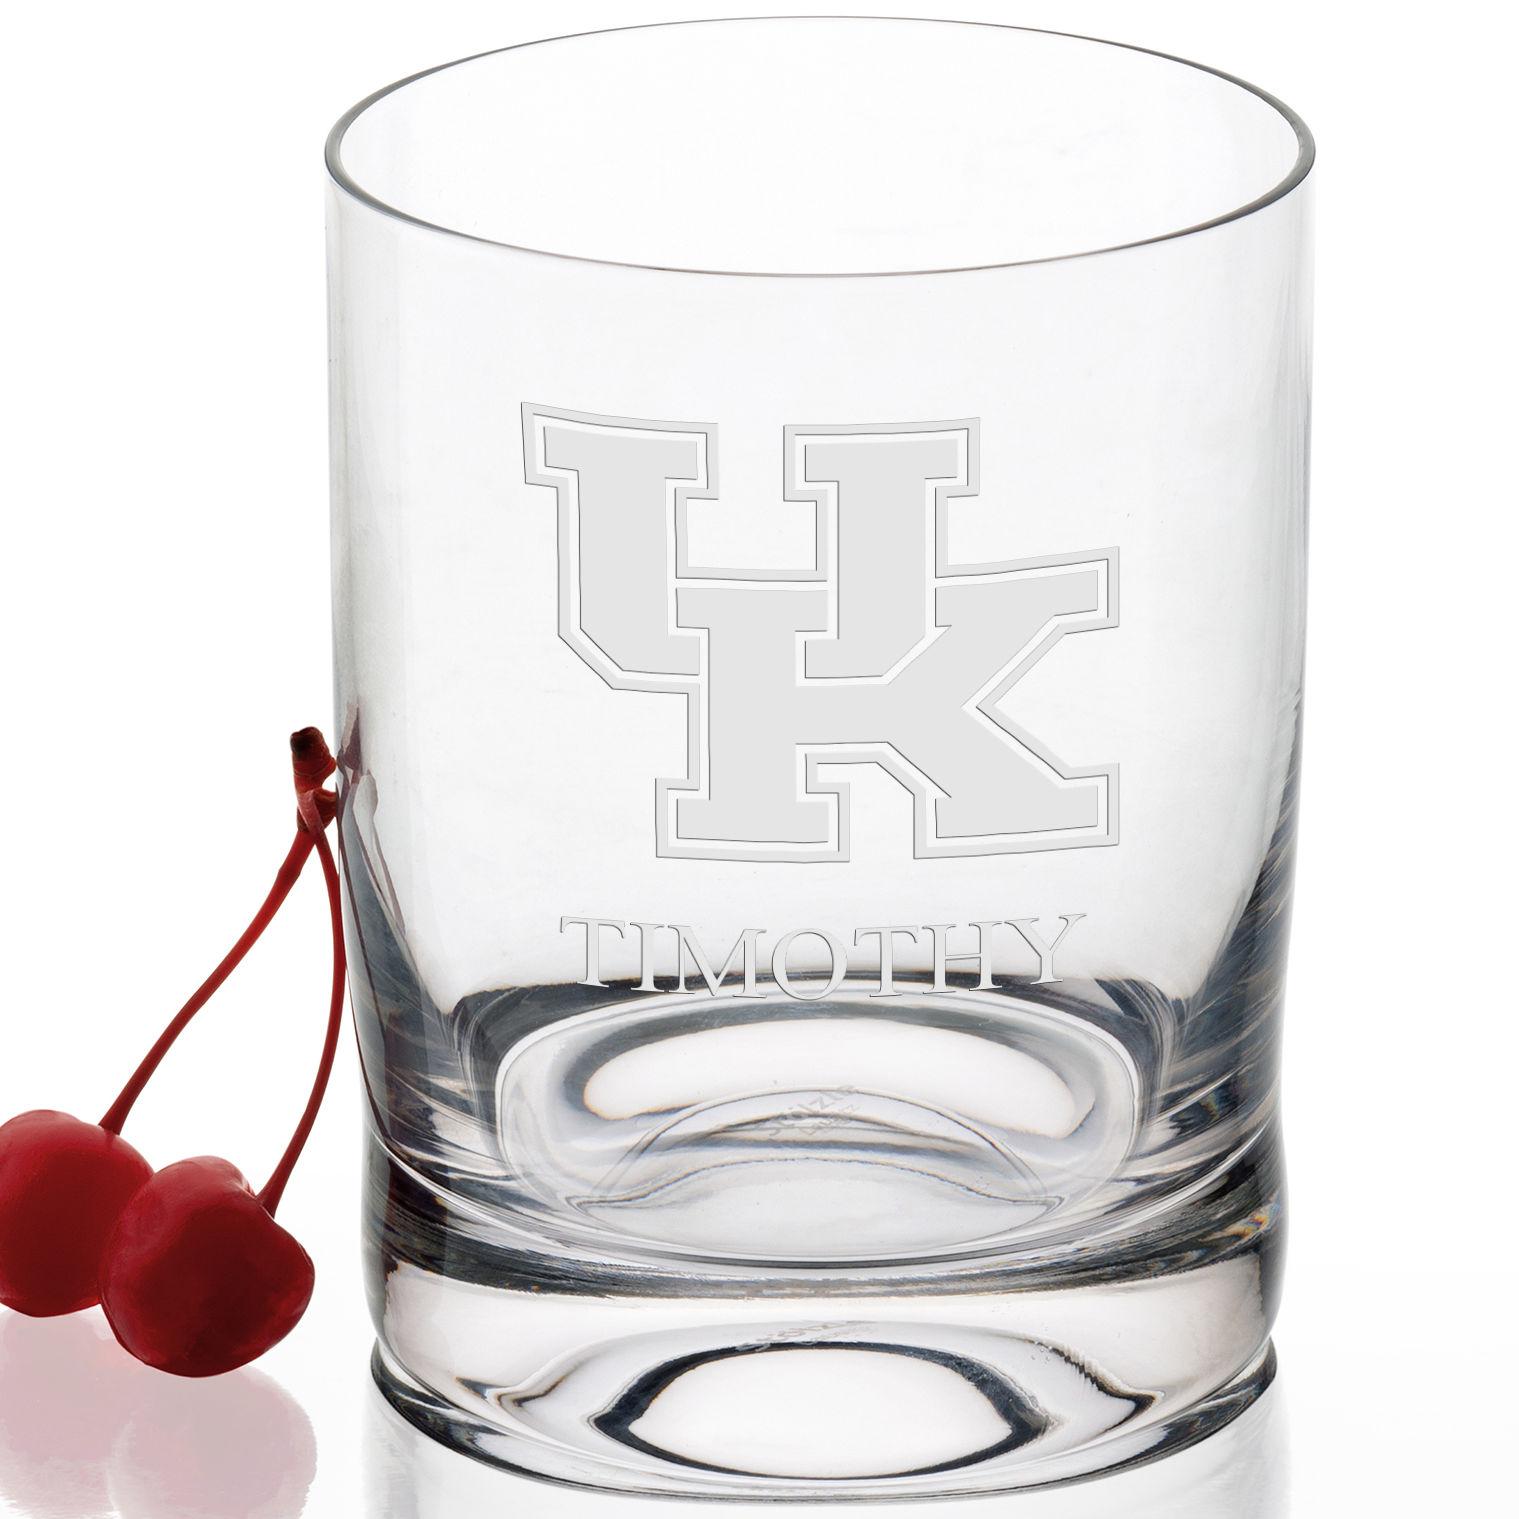 University of Kentucky Tumbler Glasses - Set of 4 - Image 2